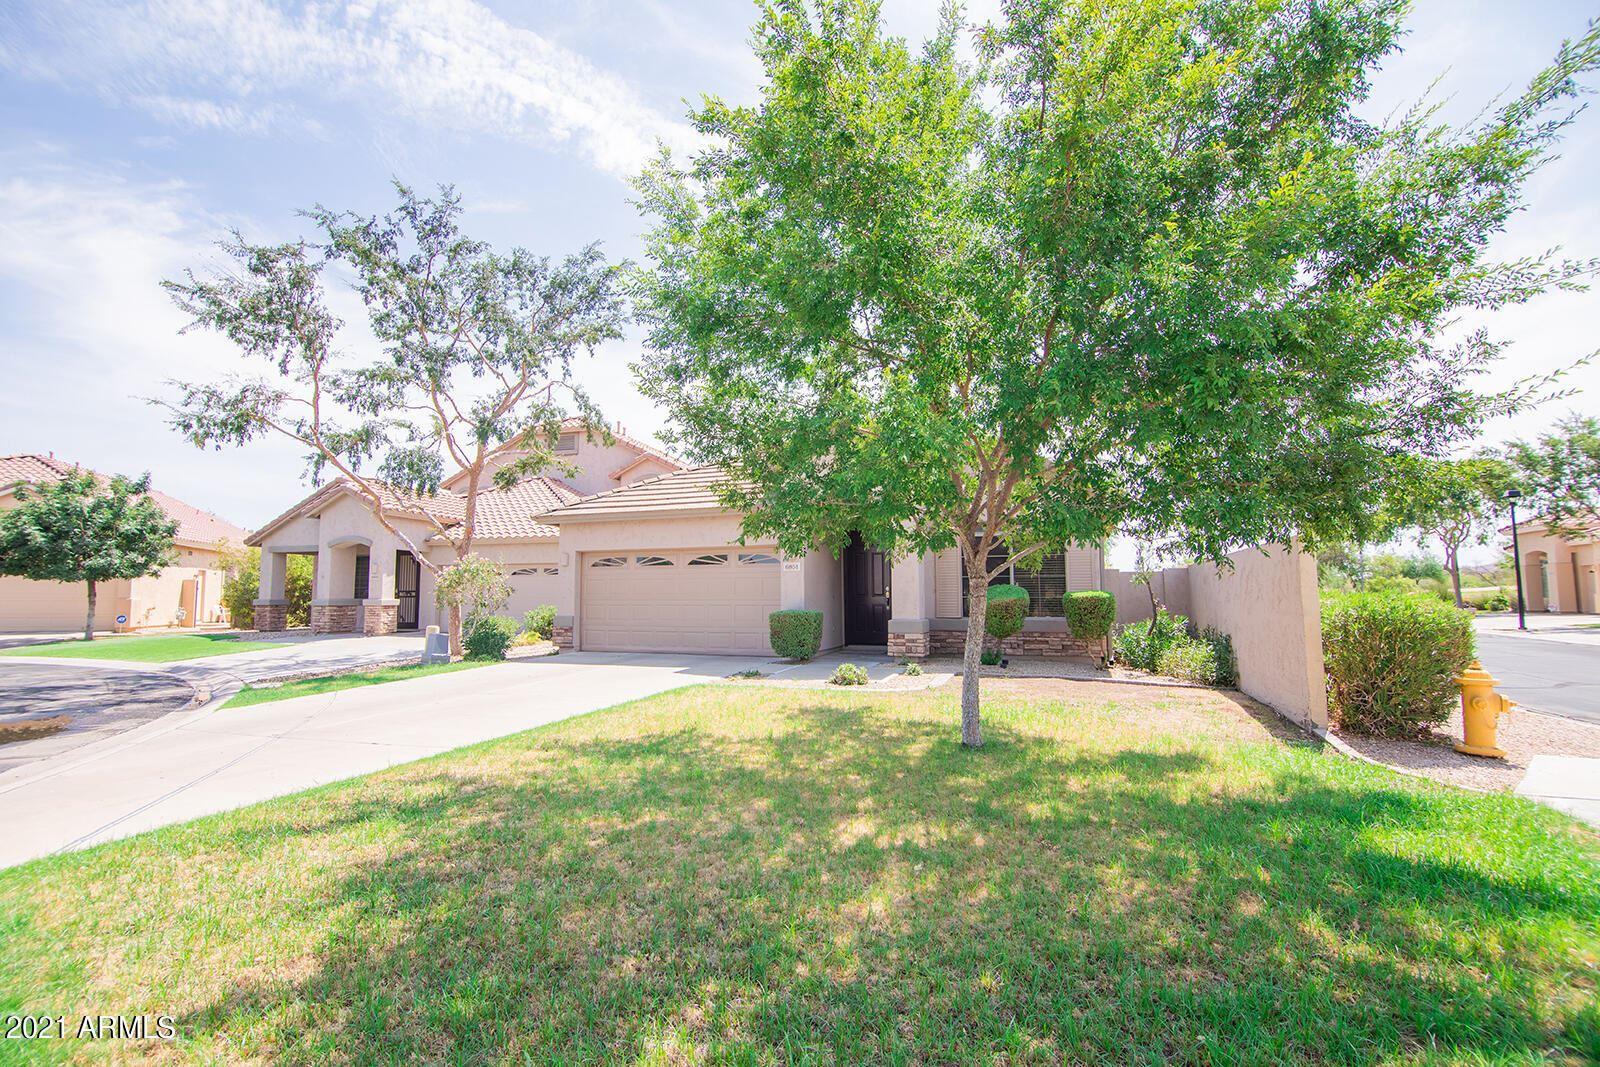 6851 S 27TH Place, Phoenix, AZ 85042 - MLS#: 6267694